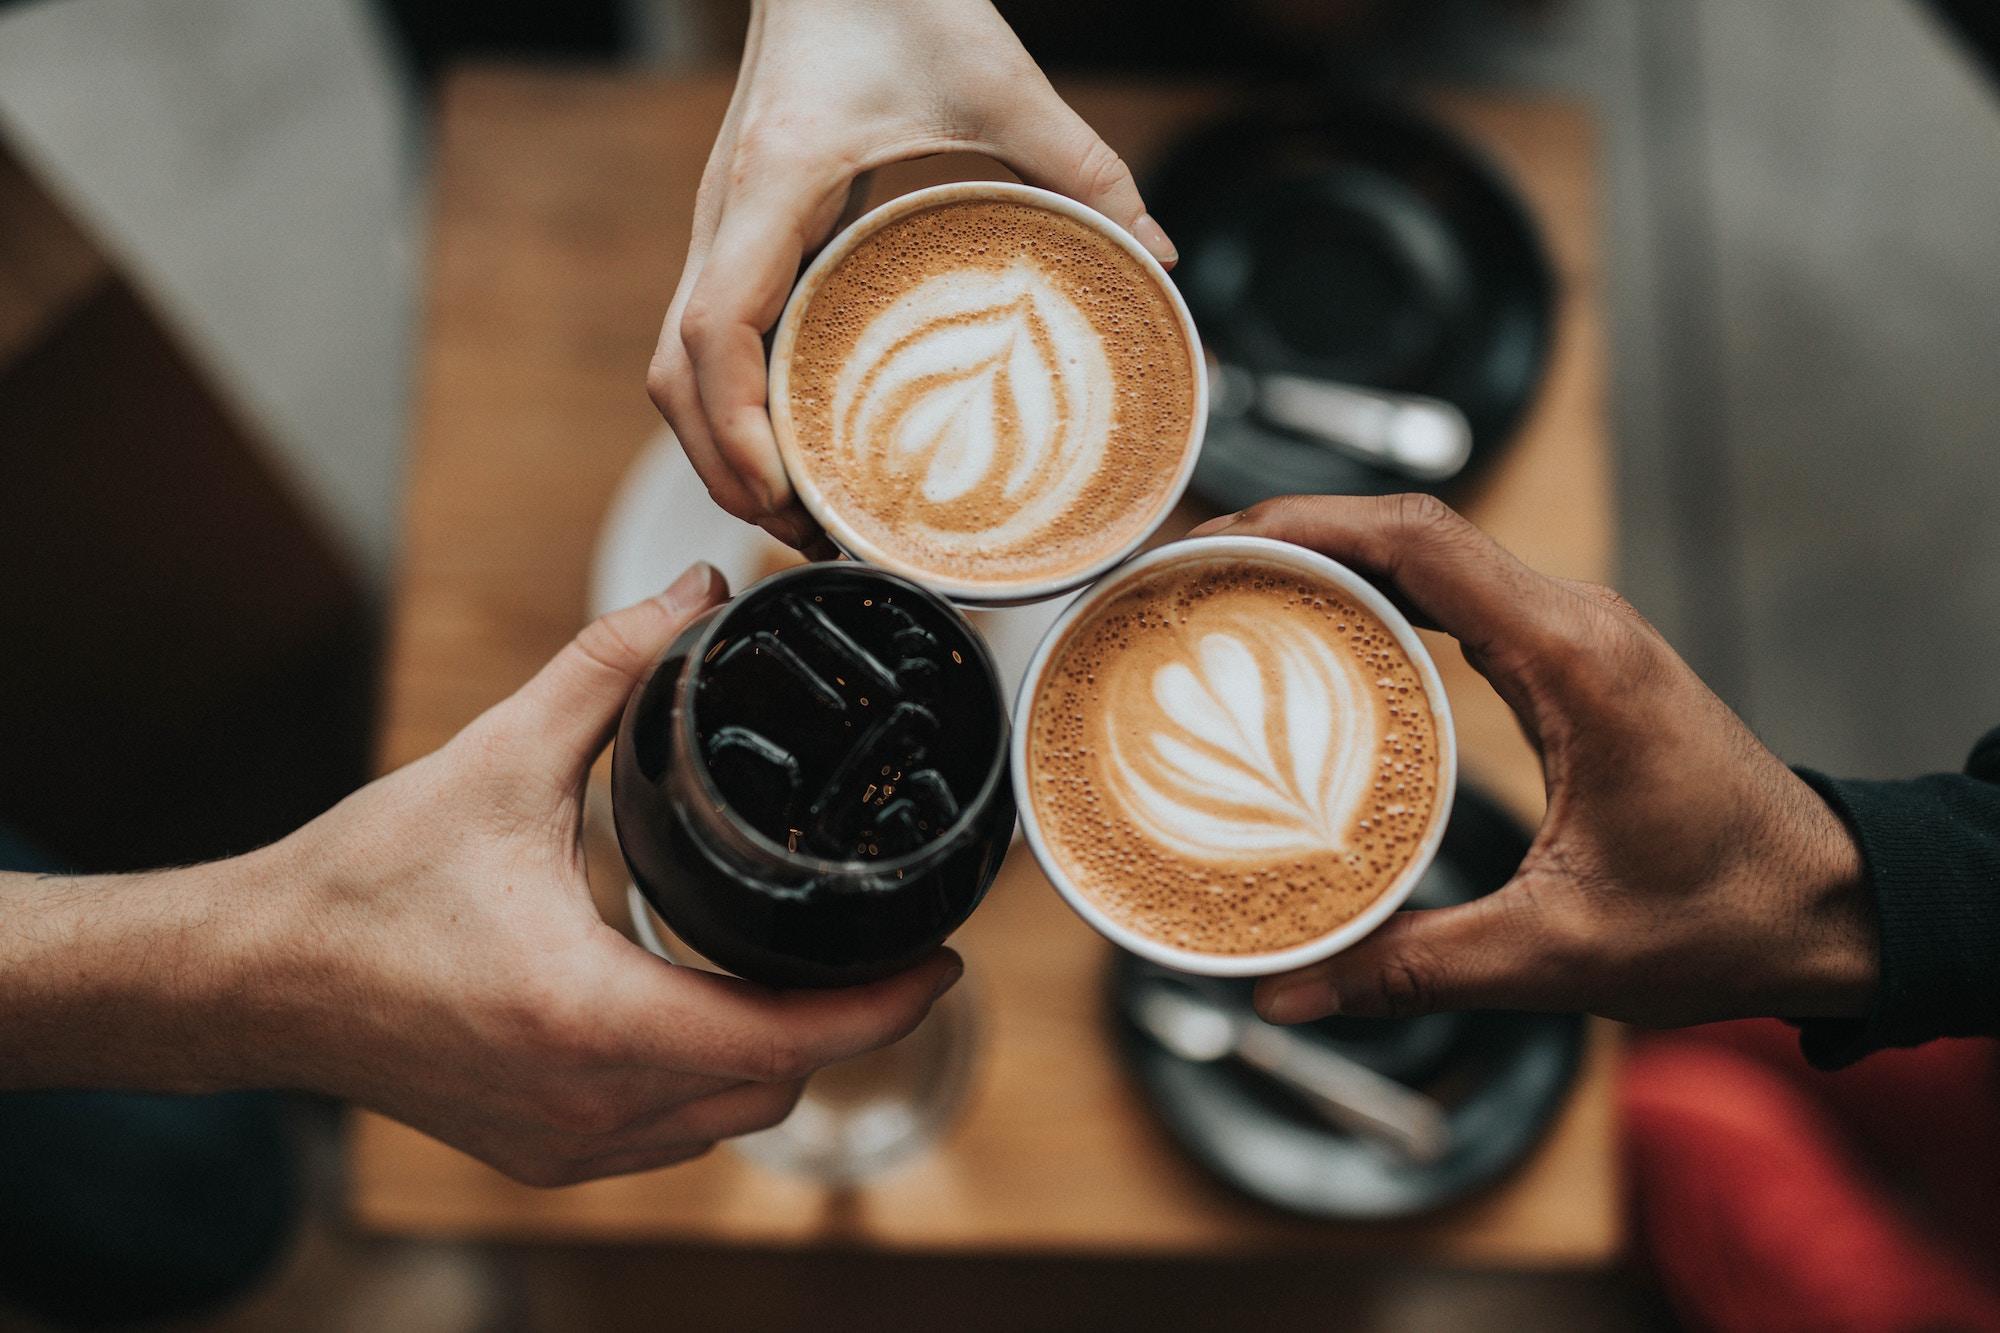 Garçon Coffee Lets You Order like a Local